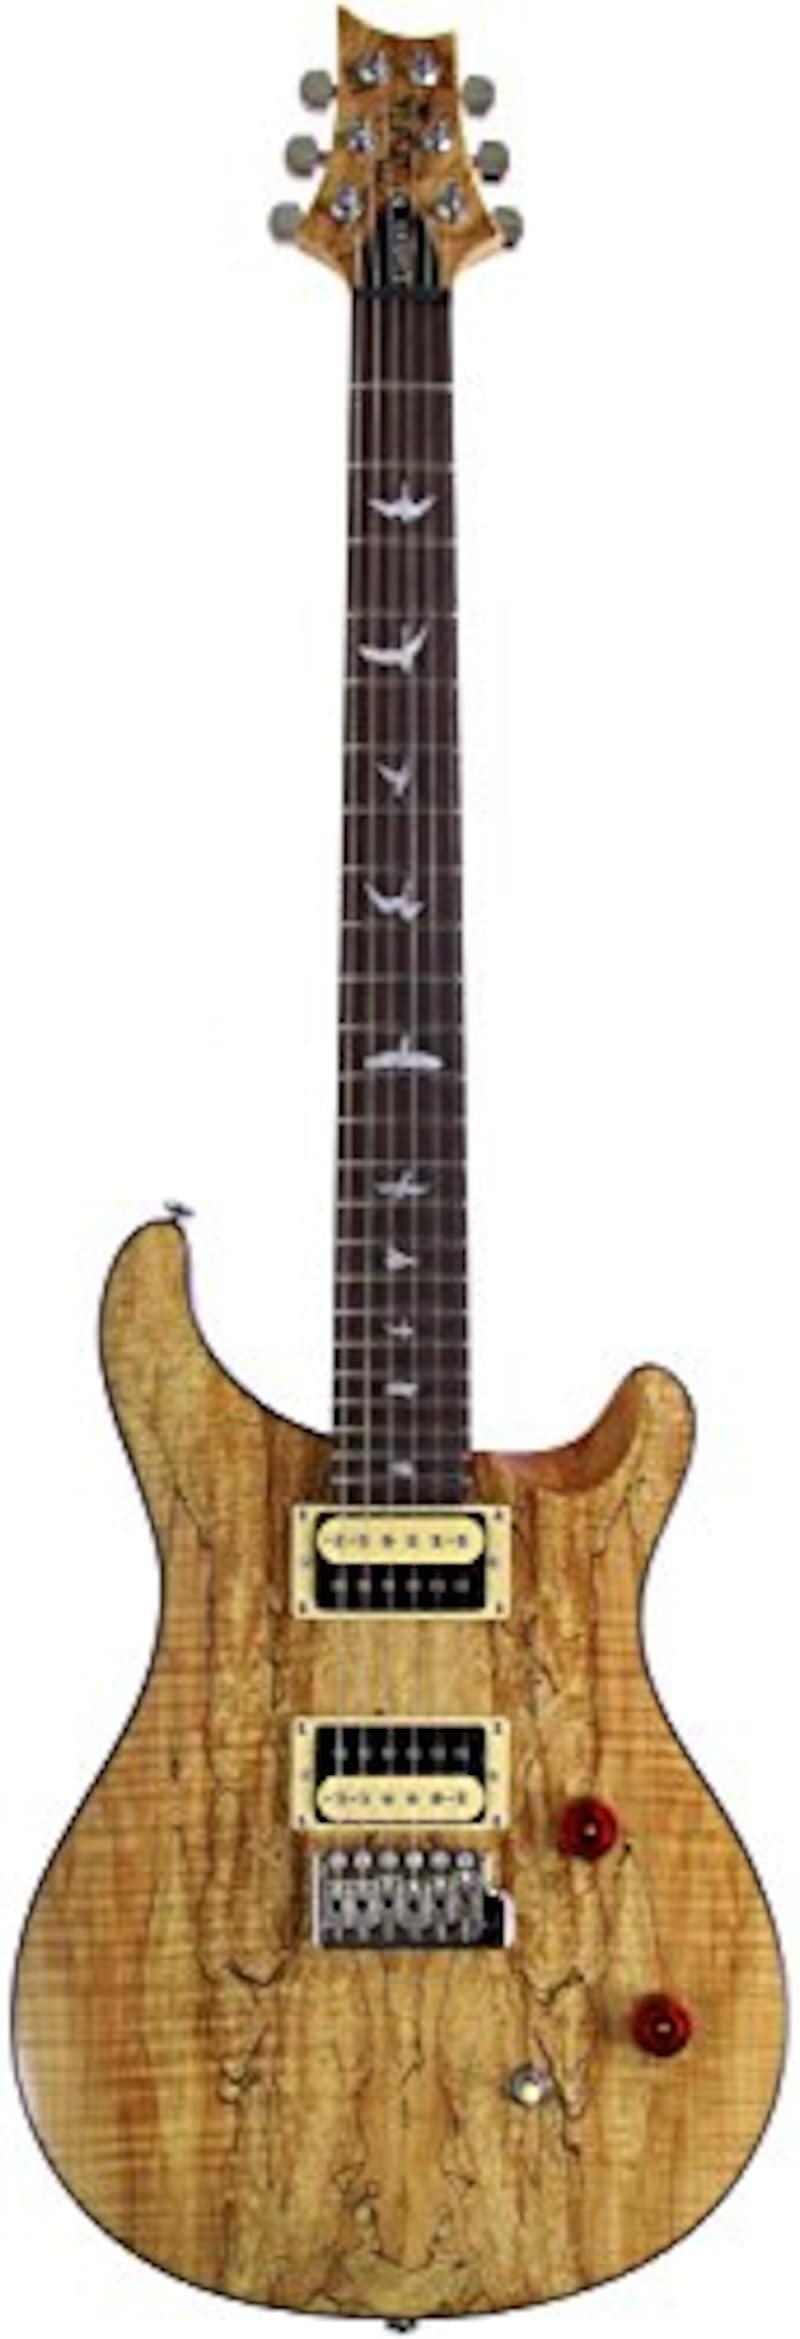 PRS ポールリードスミス エレキギター Ikebe Original SE CUSTOM 24 Bird Inlay Spalted Maple Top